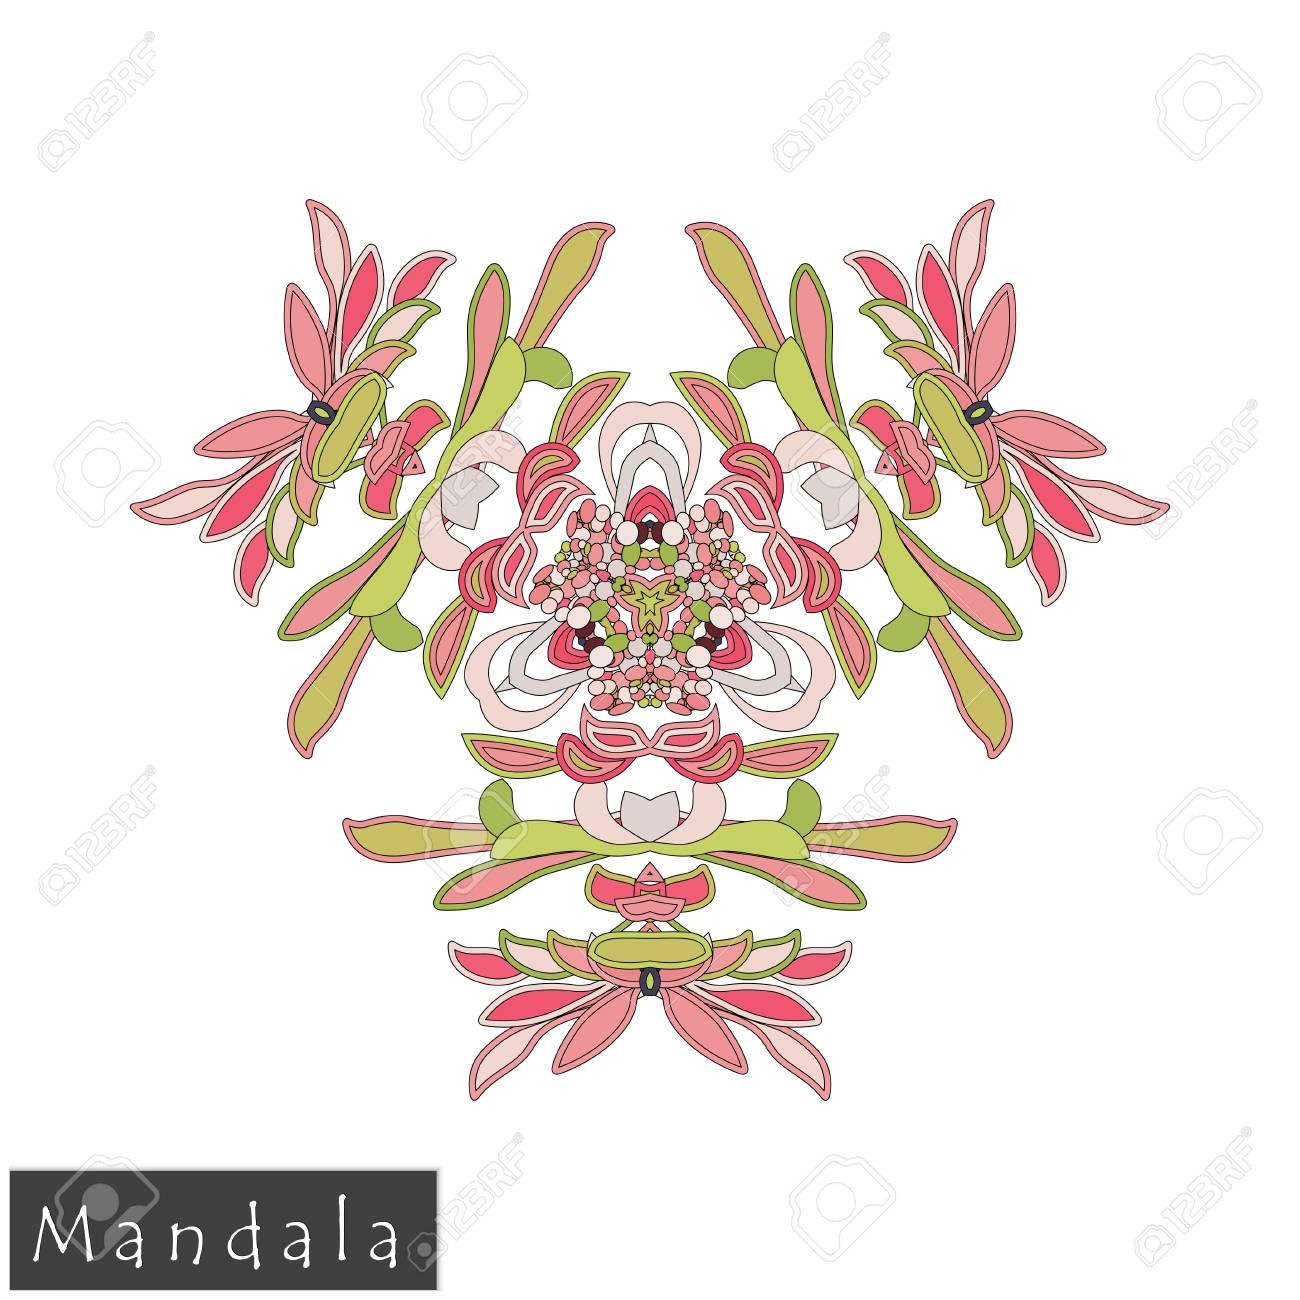 Floral Symmetrical Geometrical Symbol Flower Mandala Icon Isolated